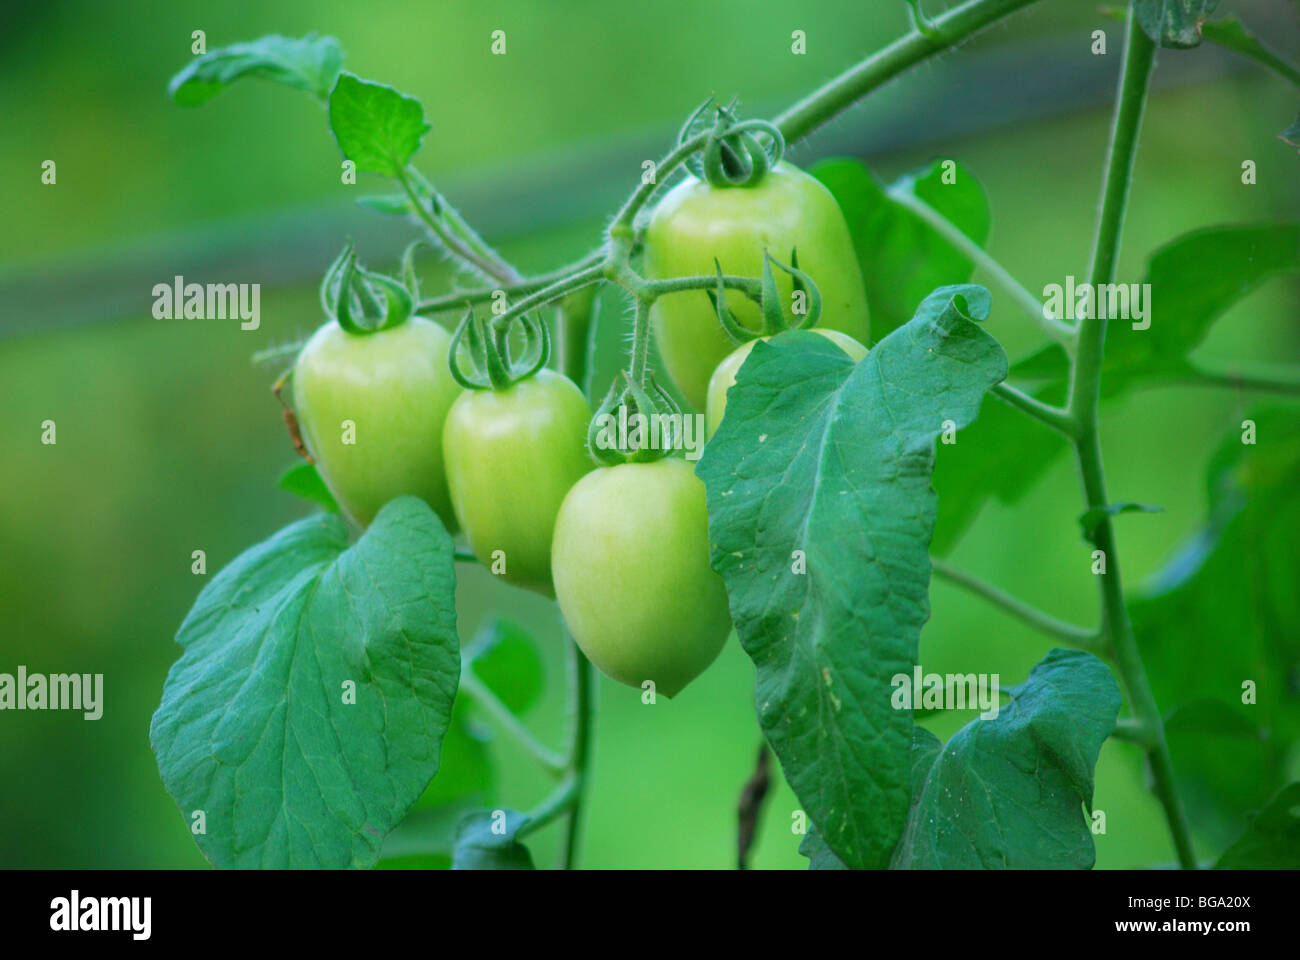 tomato plant - Stock Image